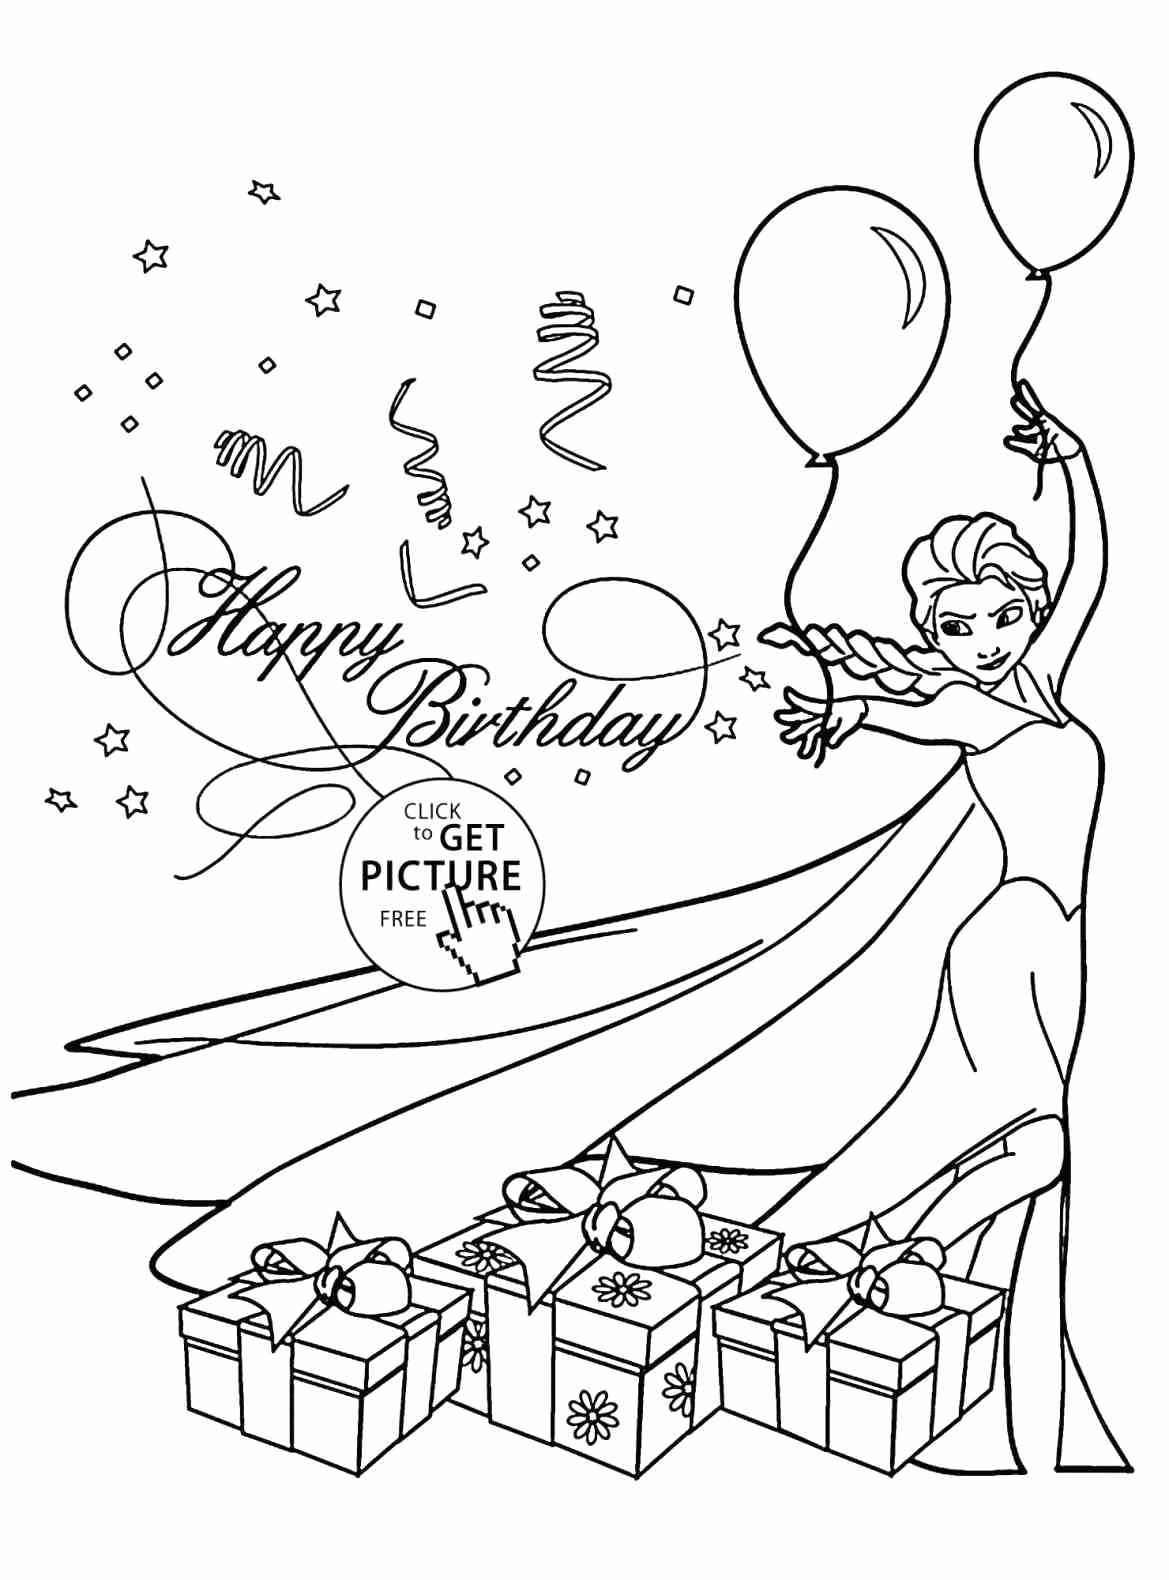 Birthday Cards Drawing At Getdrawings